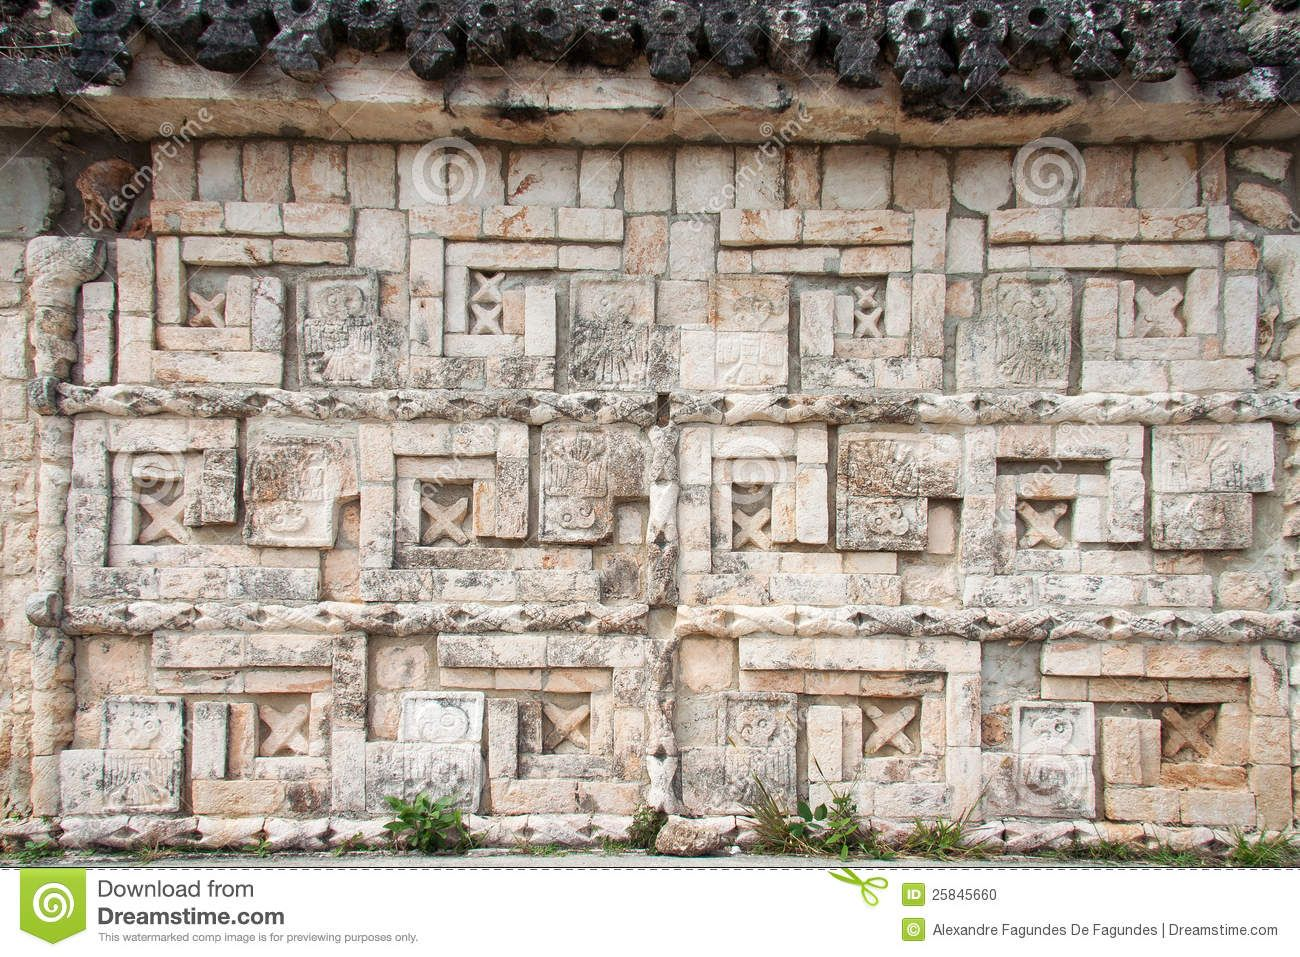 uxmal-carved-wall-yucatan-mexico-25845660.jpg (1300×957)